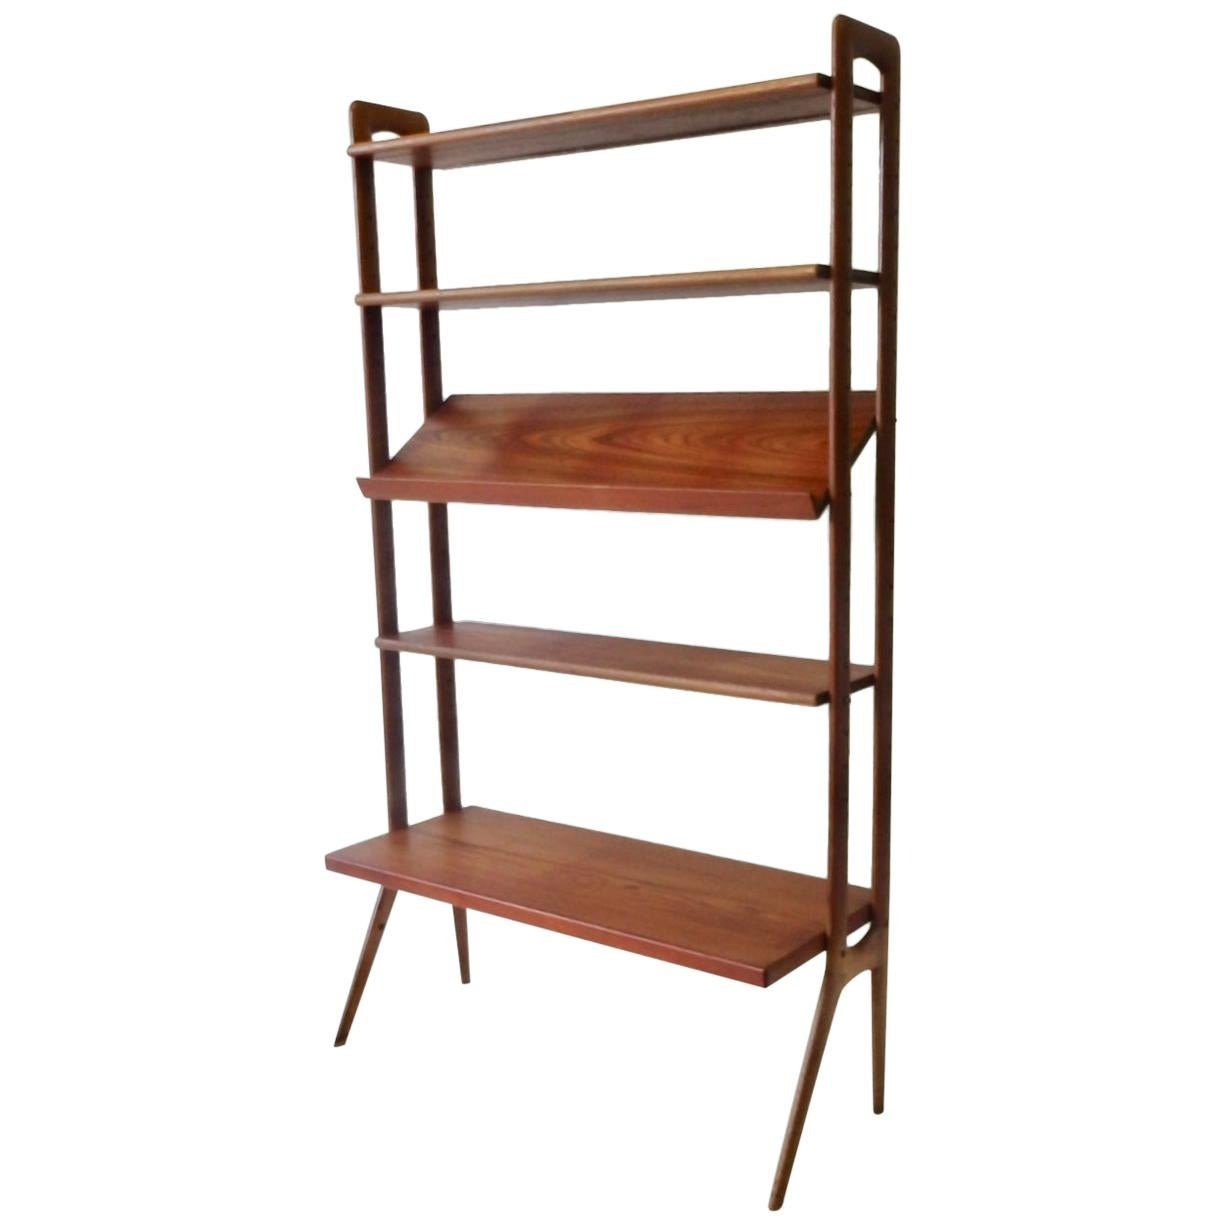 Kurt Ostervig Povl Dinesen Danish Teak Adjustable Bookshelf with Display Shelf